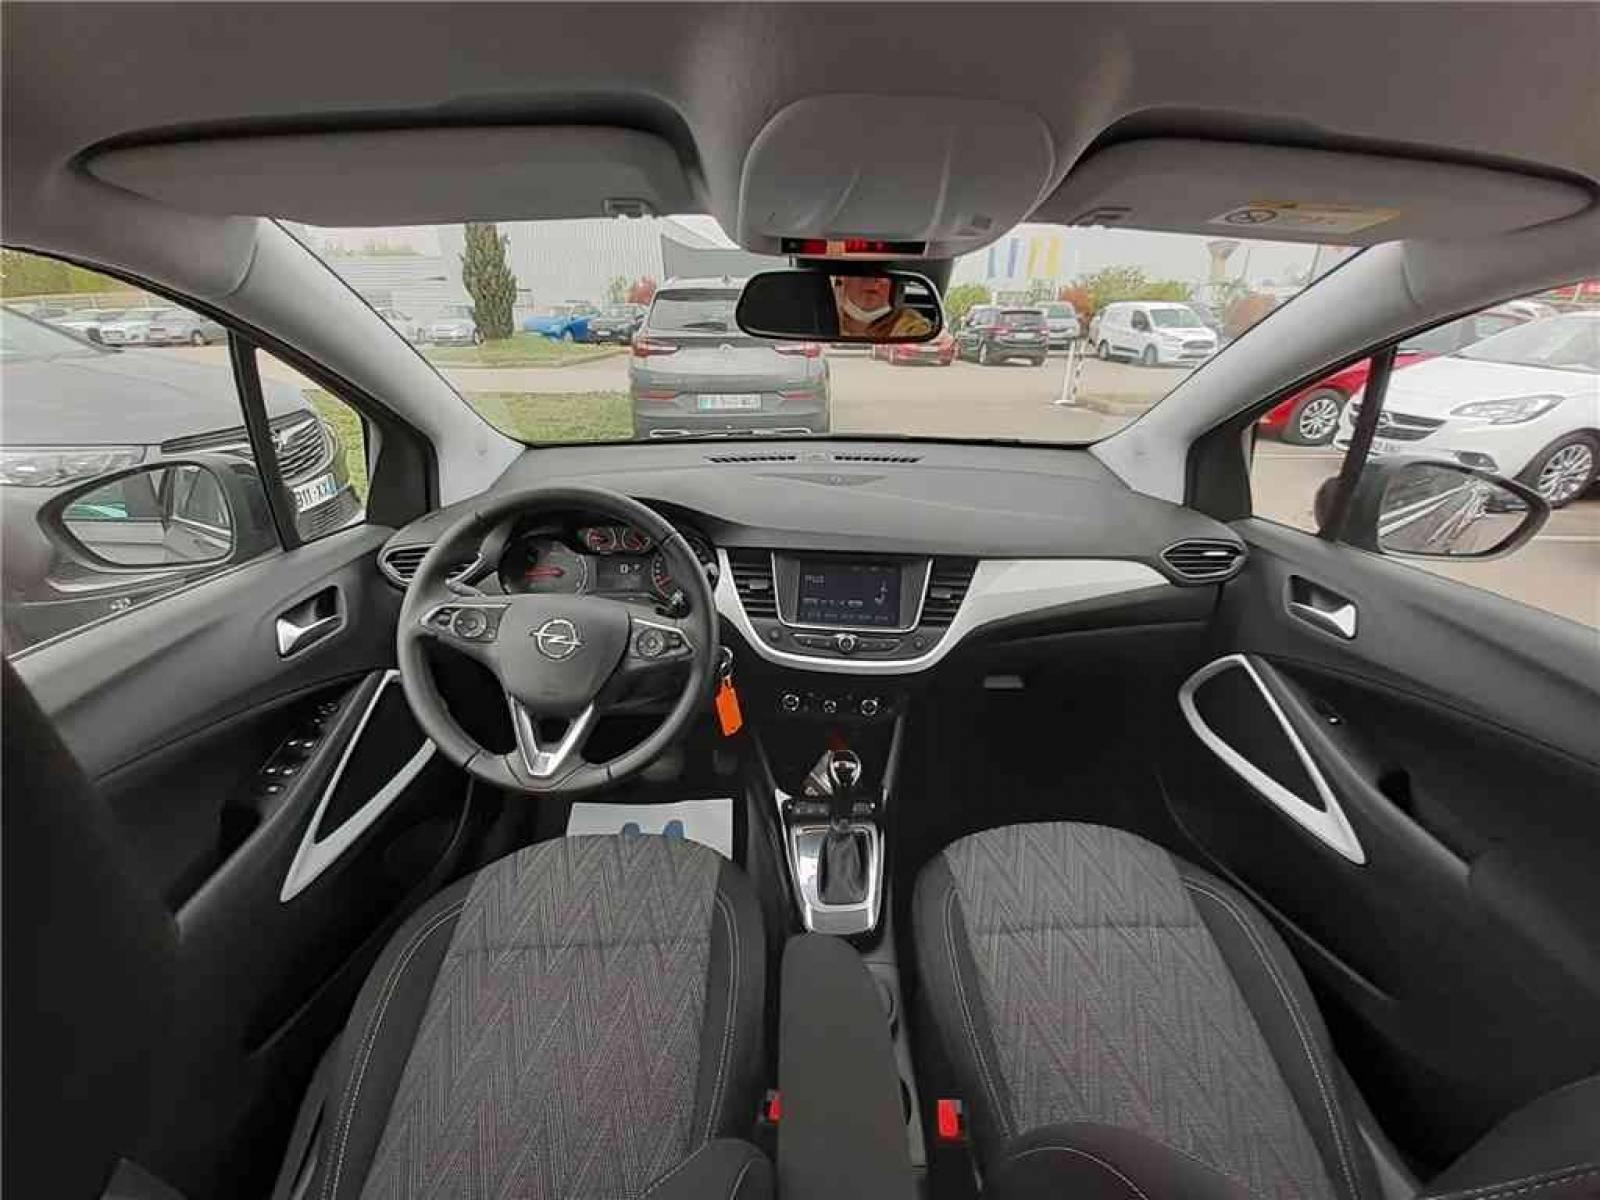 OPEL Crossland X 1.2 Turbo 130 ch BVA6 - véhicule d'occasion - Groupe Guillet - Opel Magicauto - Chalon-sur-Saône - 71380 - Saint-Marcel - 36